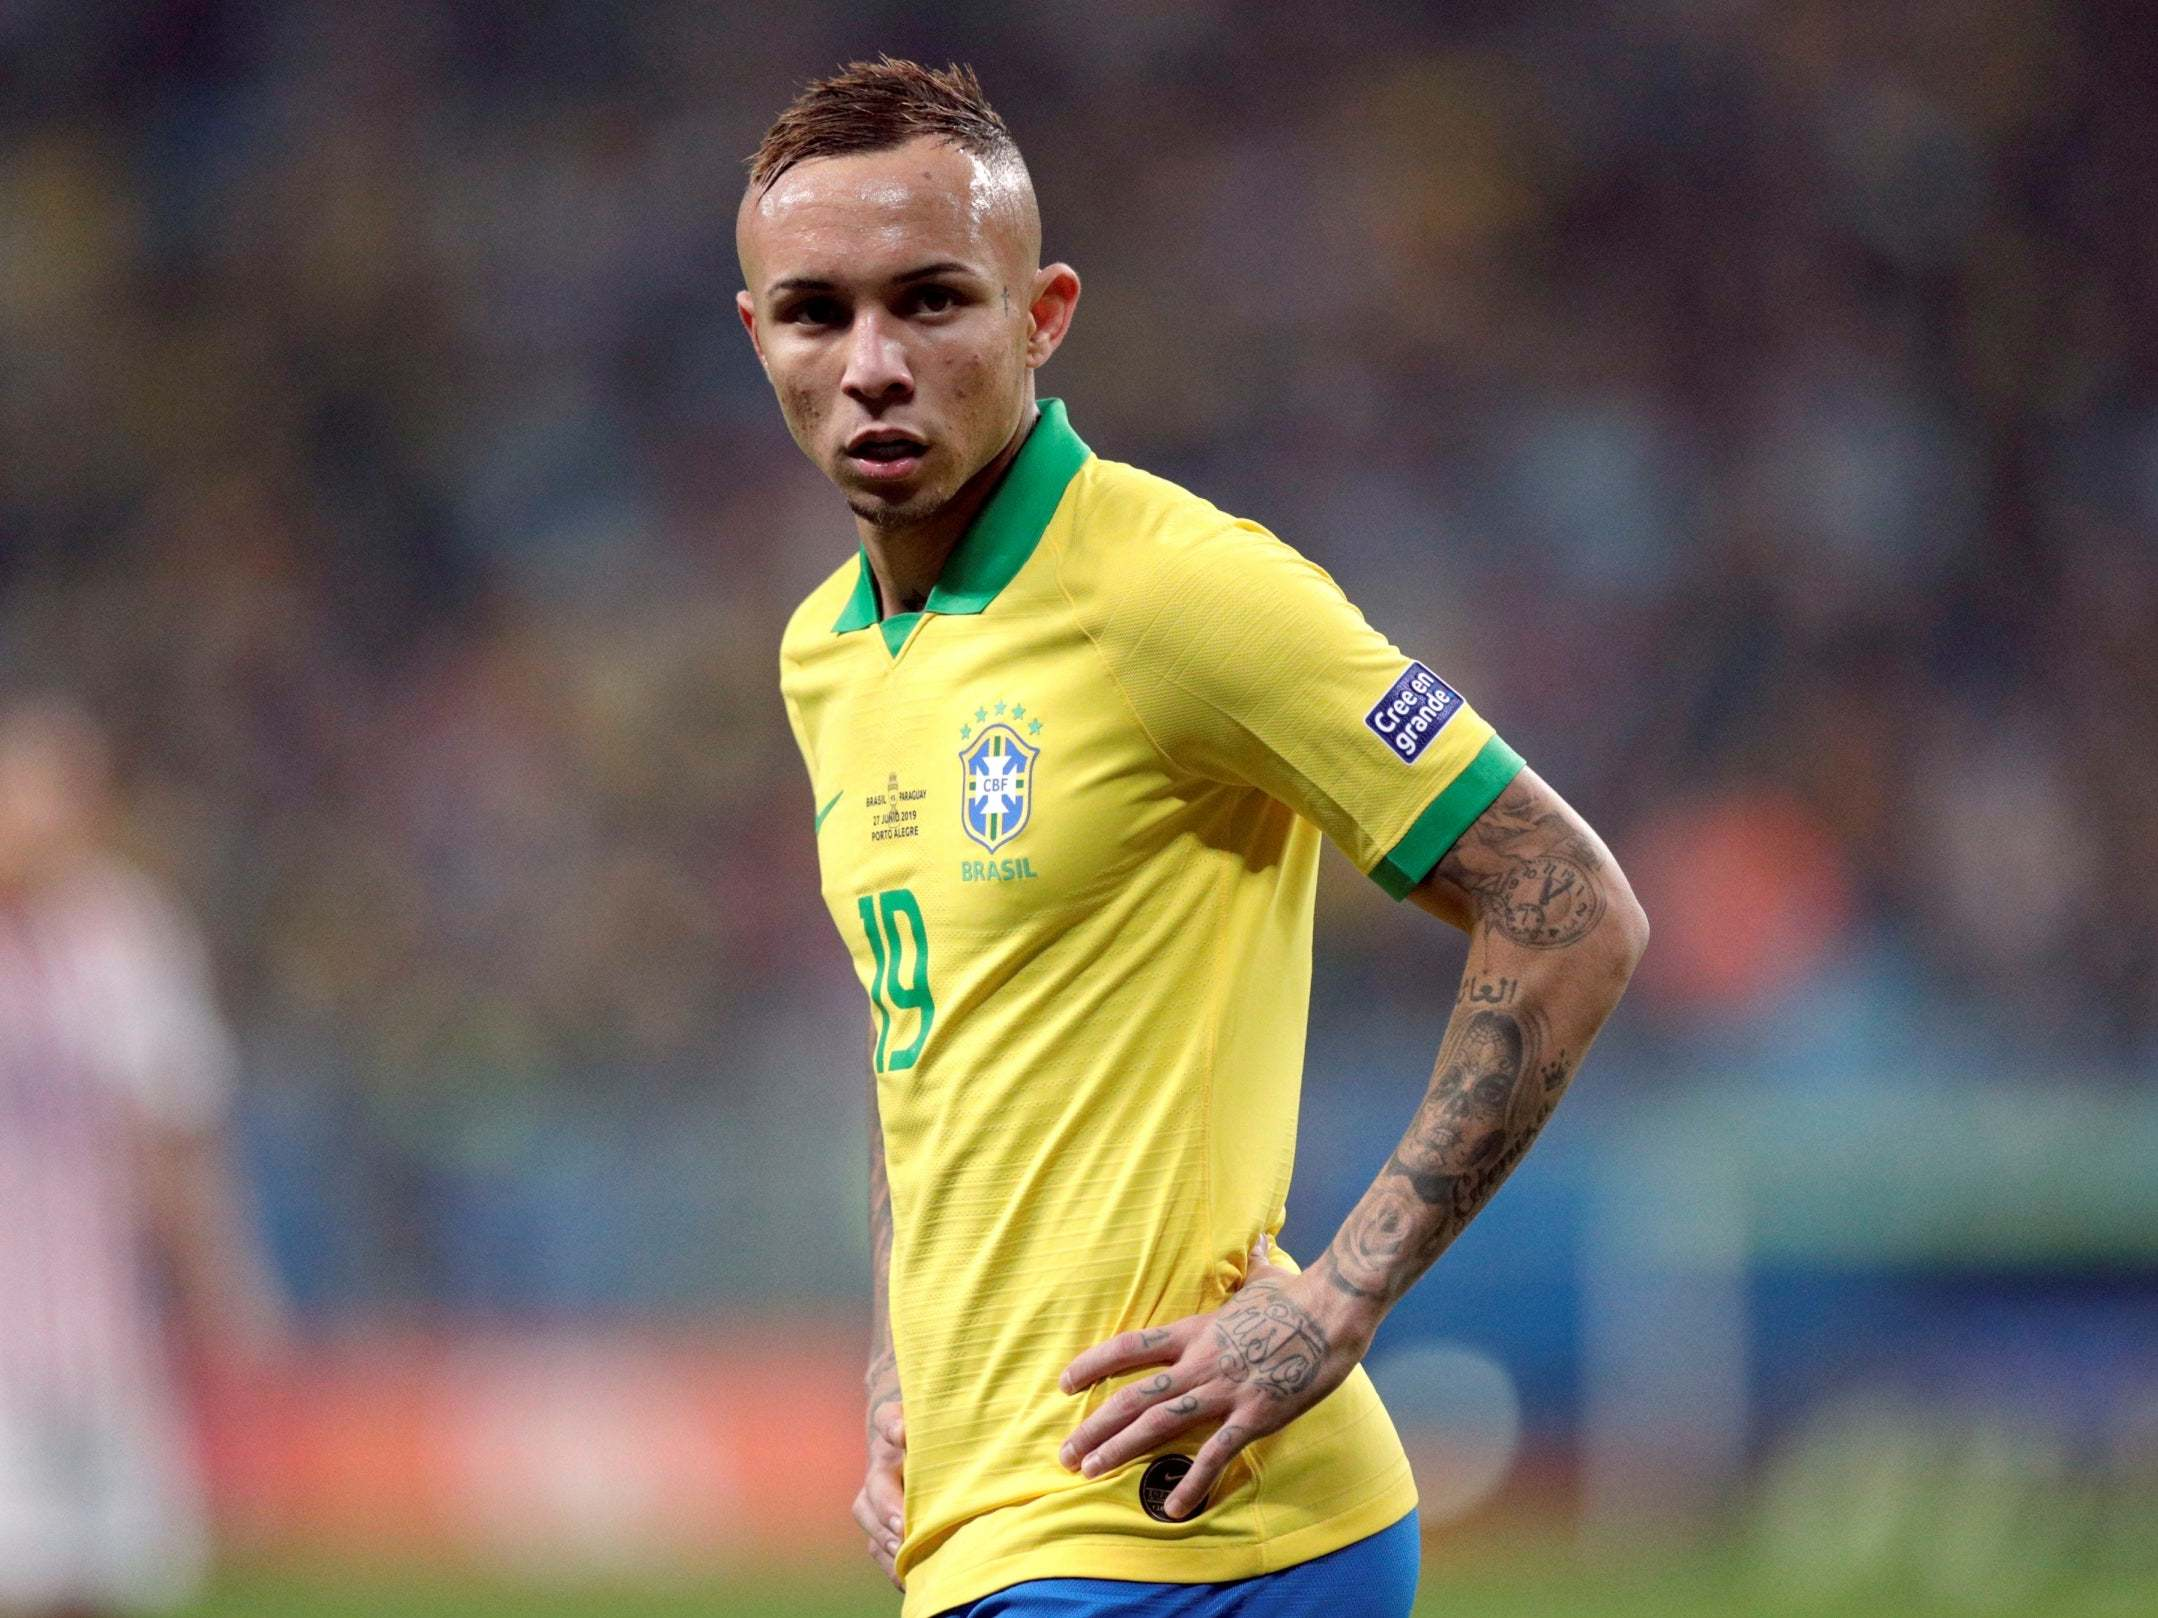 Arsenal transfer news: Everton Soares, Wilfried Zaha, Kieran Tierney, Dani Ceballos, William Saliba latest